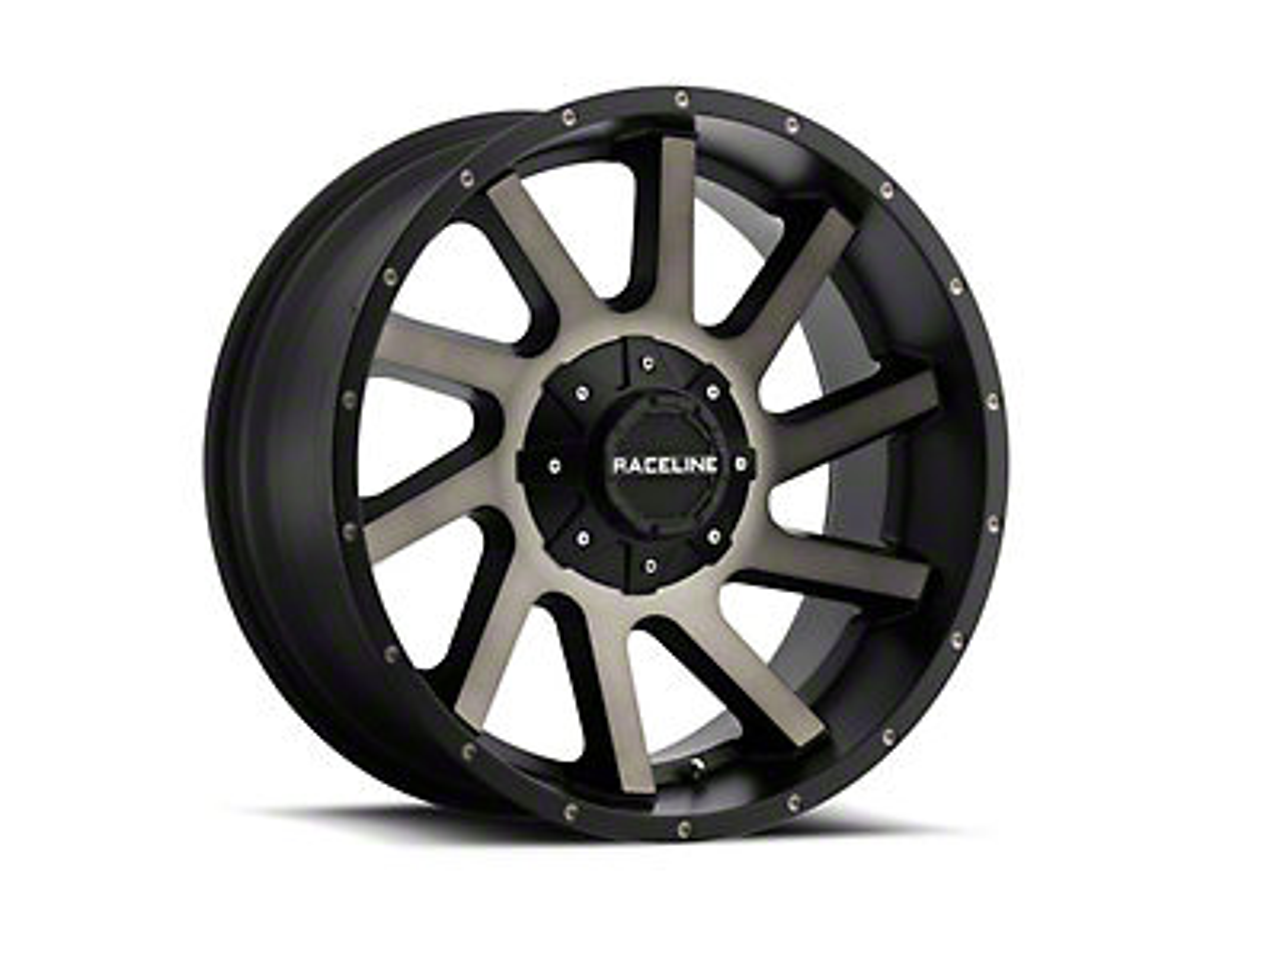 Raceline Twist Black Machined w/ Dark Tint 6-Lug Wheel - 20x12 (07-18 Sierra 1500)